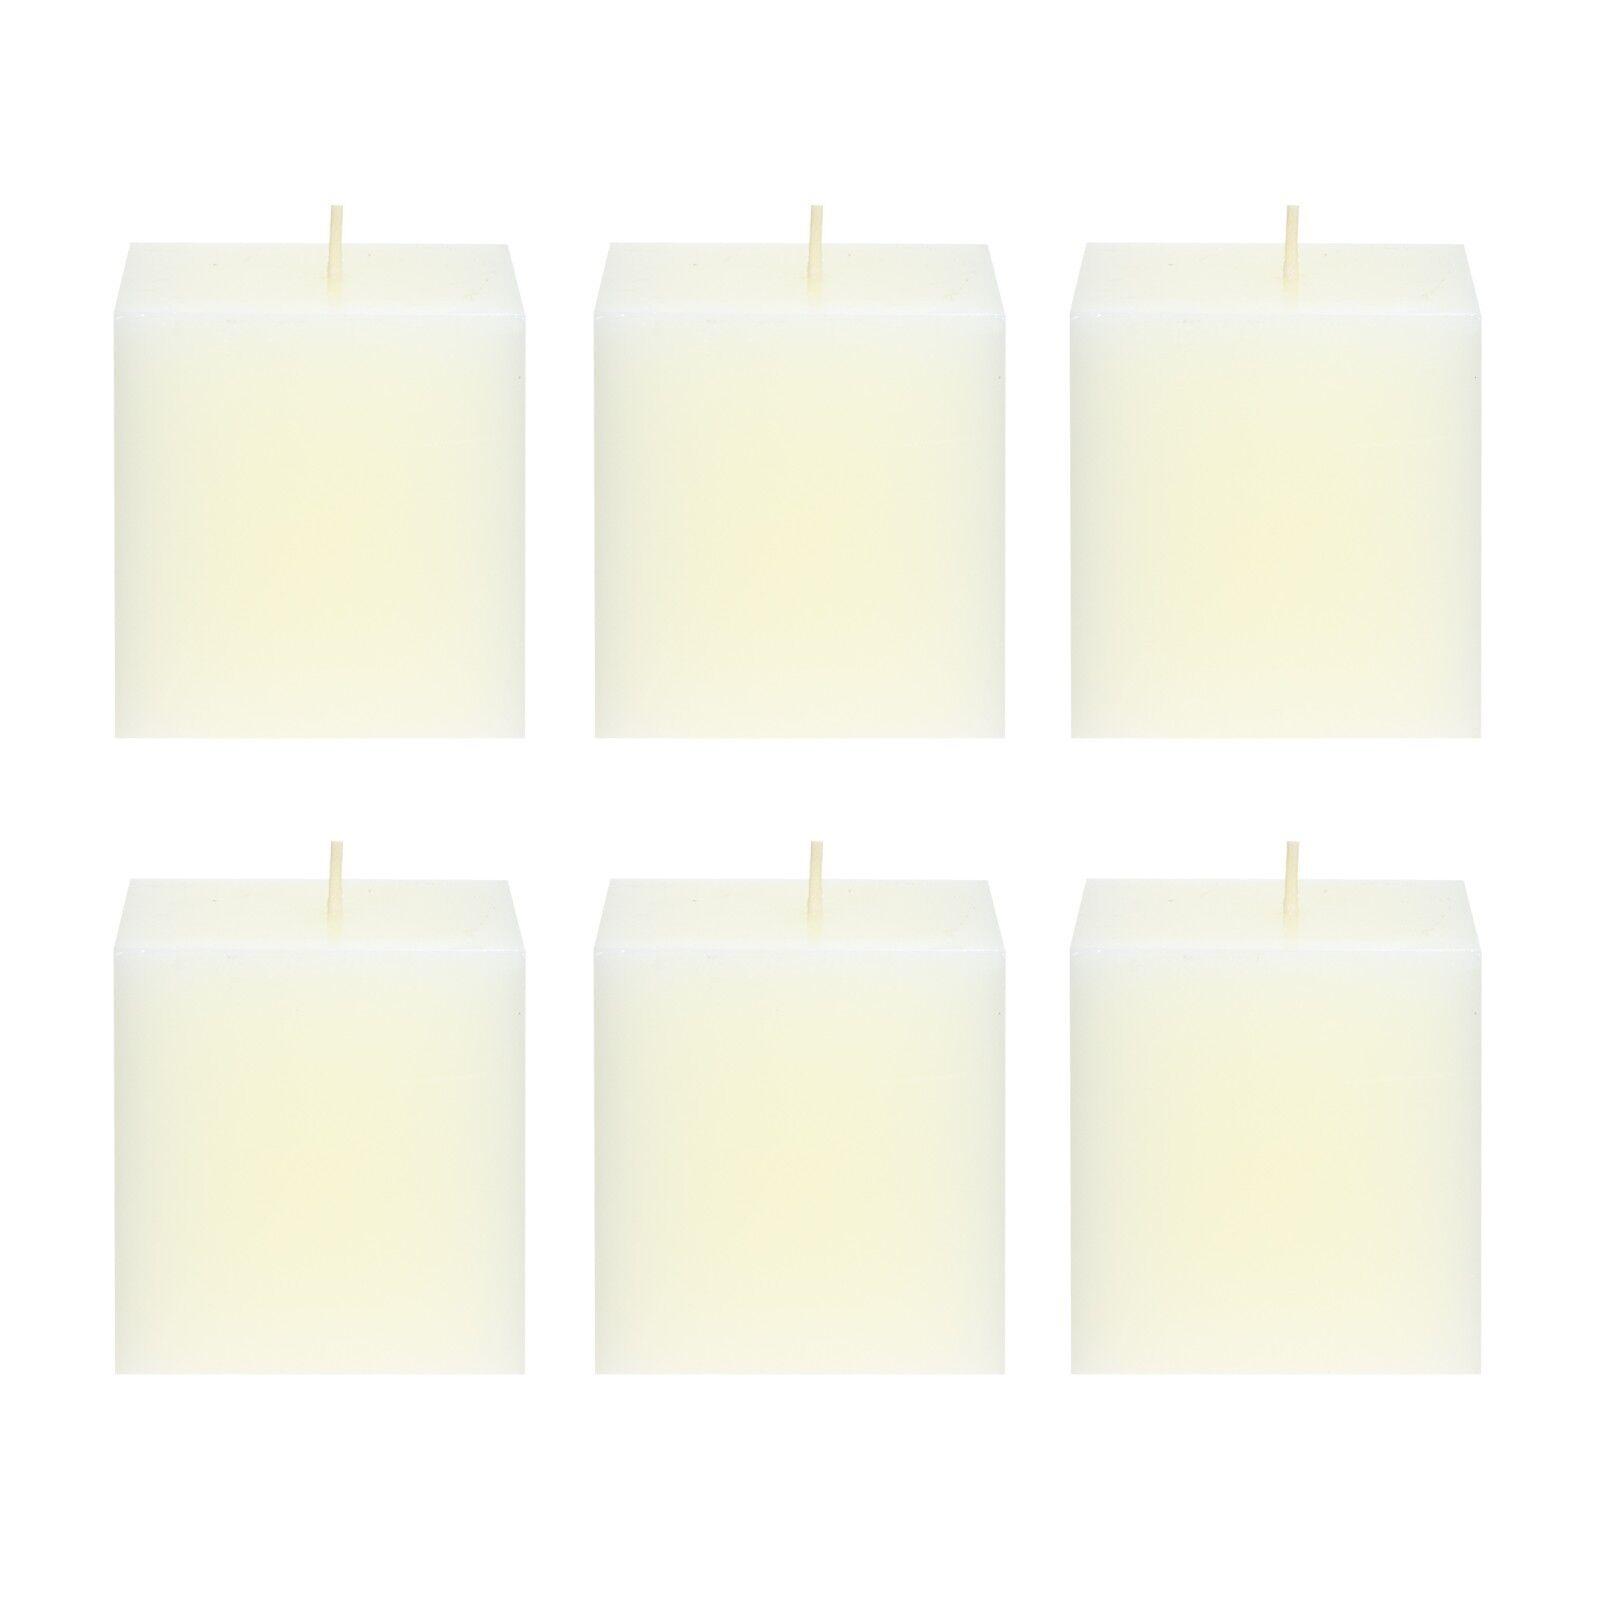 Mega Candles 3 pcs Unscented Ivory Square Pillar Candle   Ha